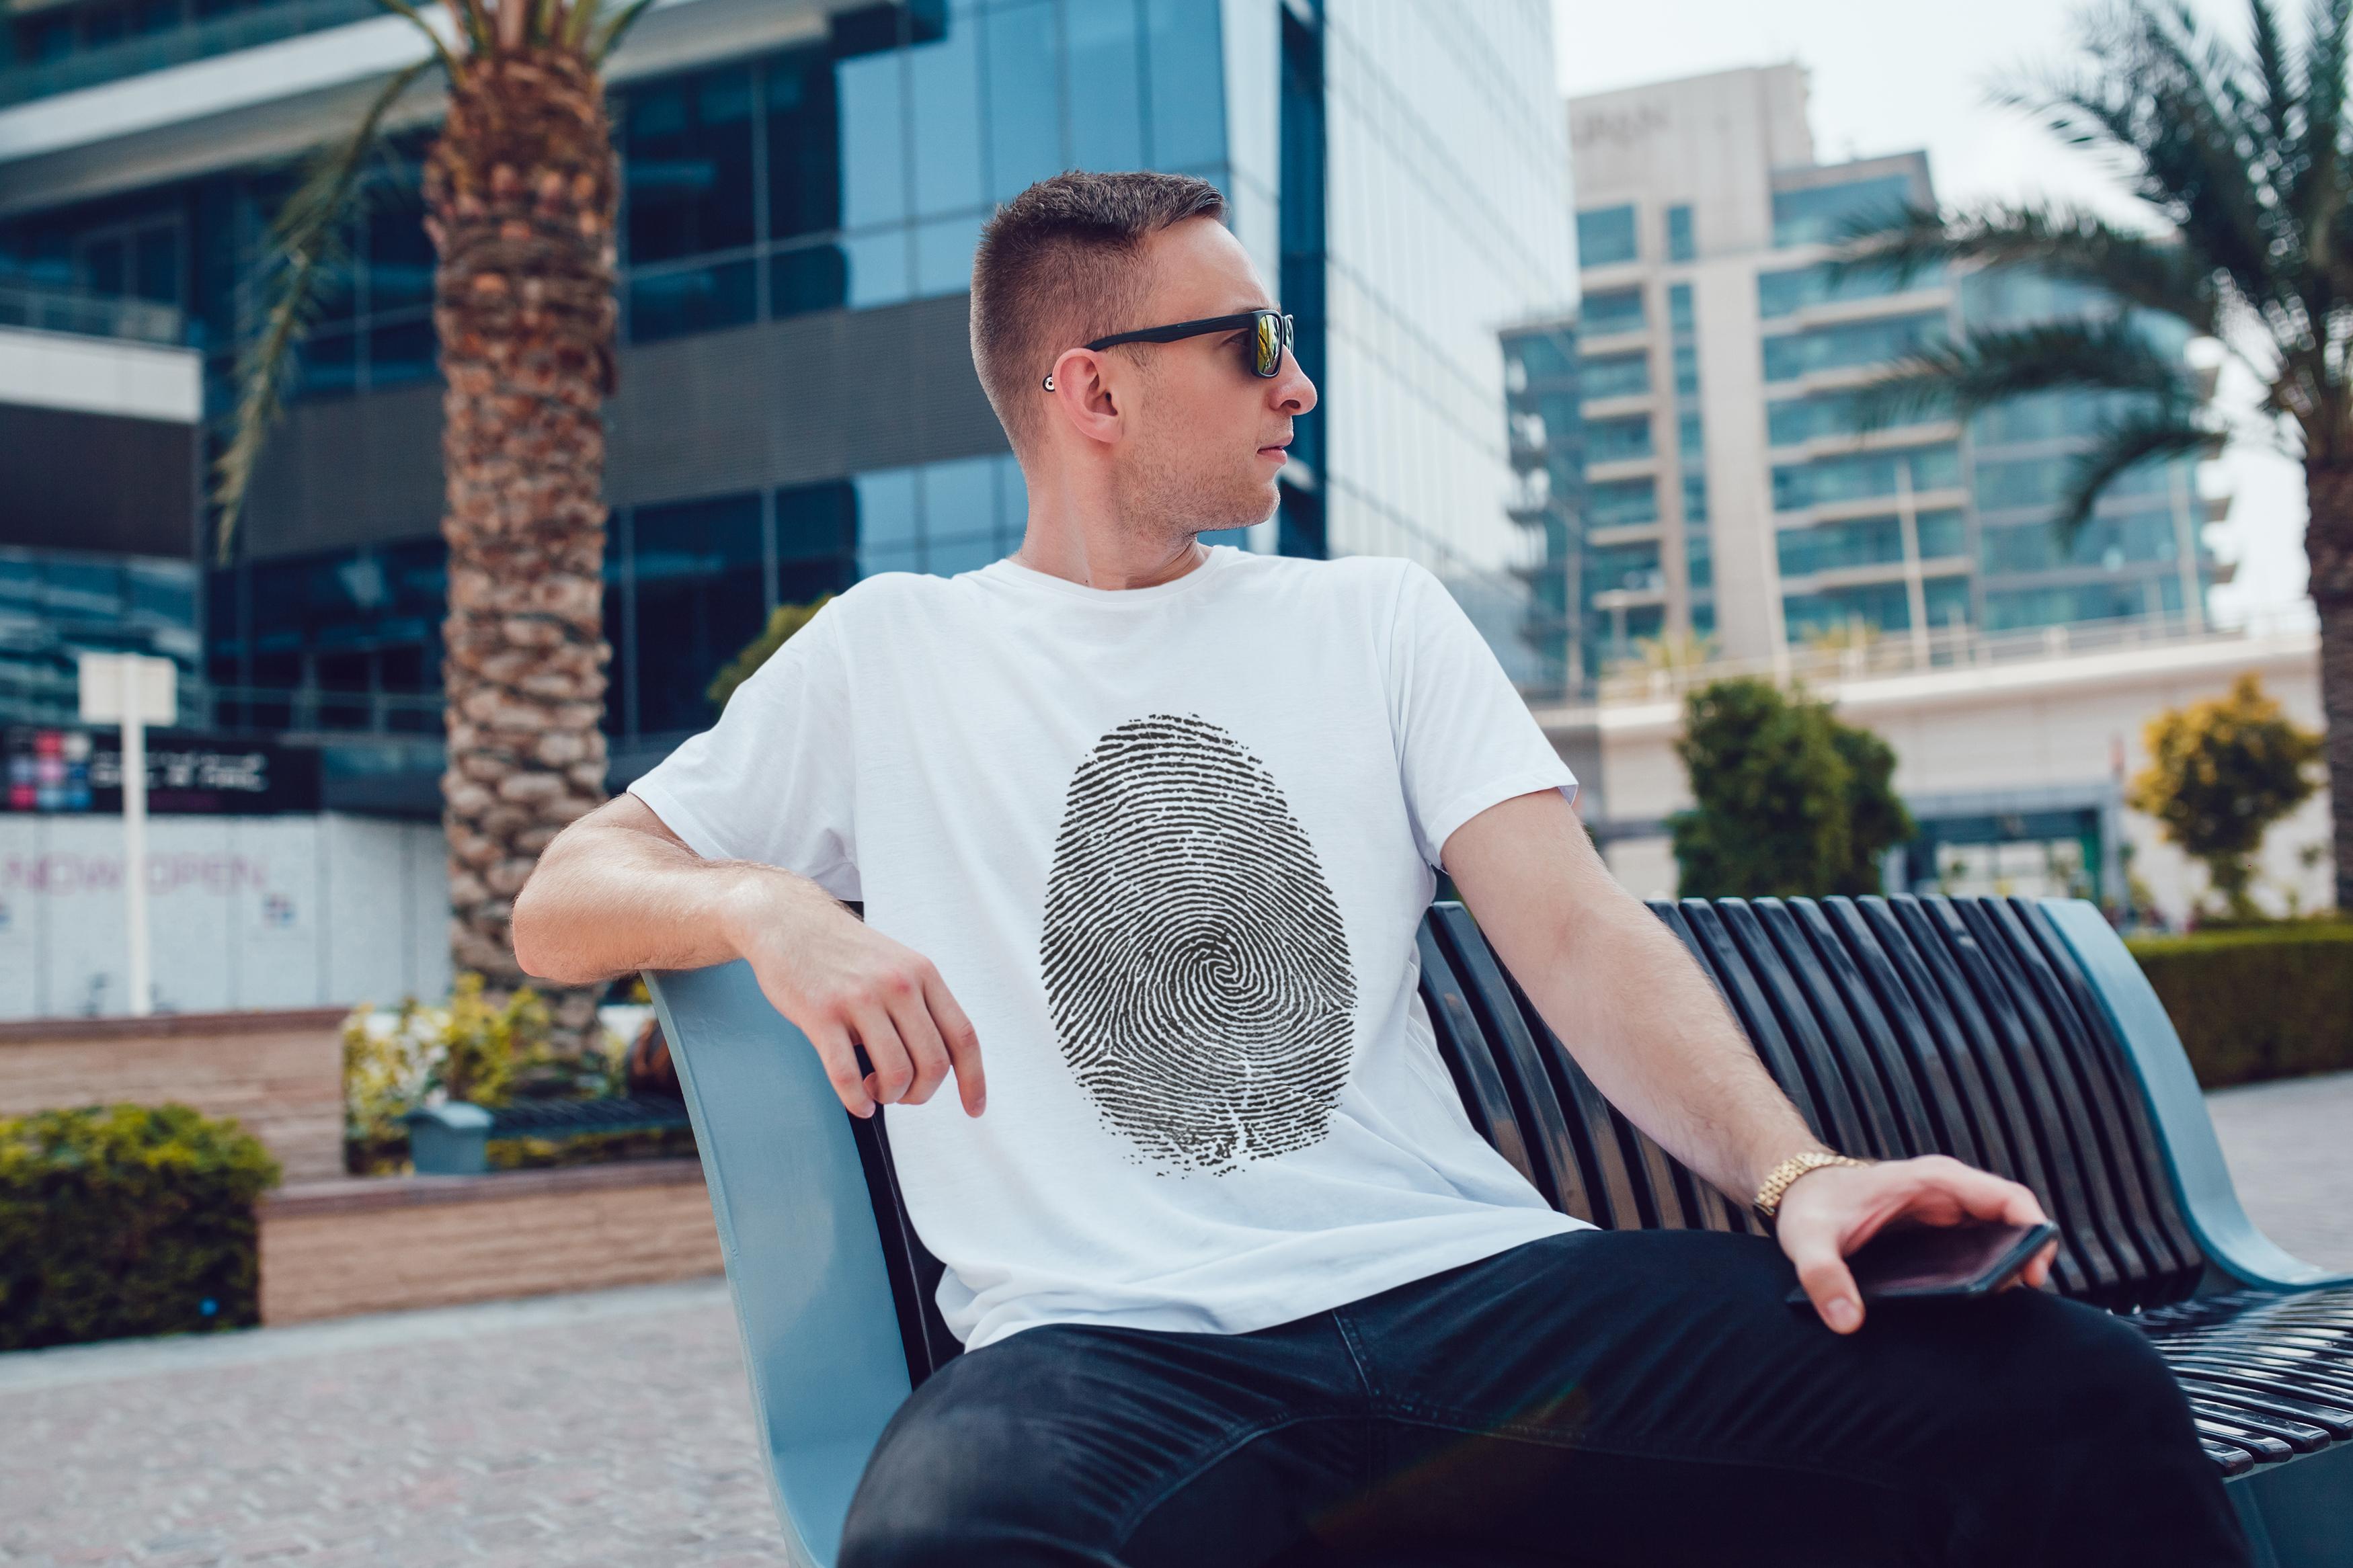 Men's T-Shirt Mock-Up Vol.5 2017 example image 12